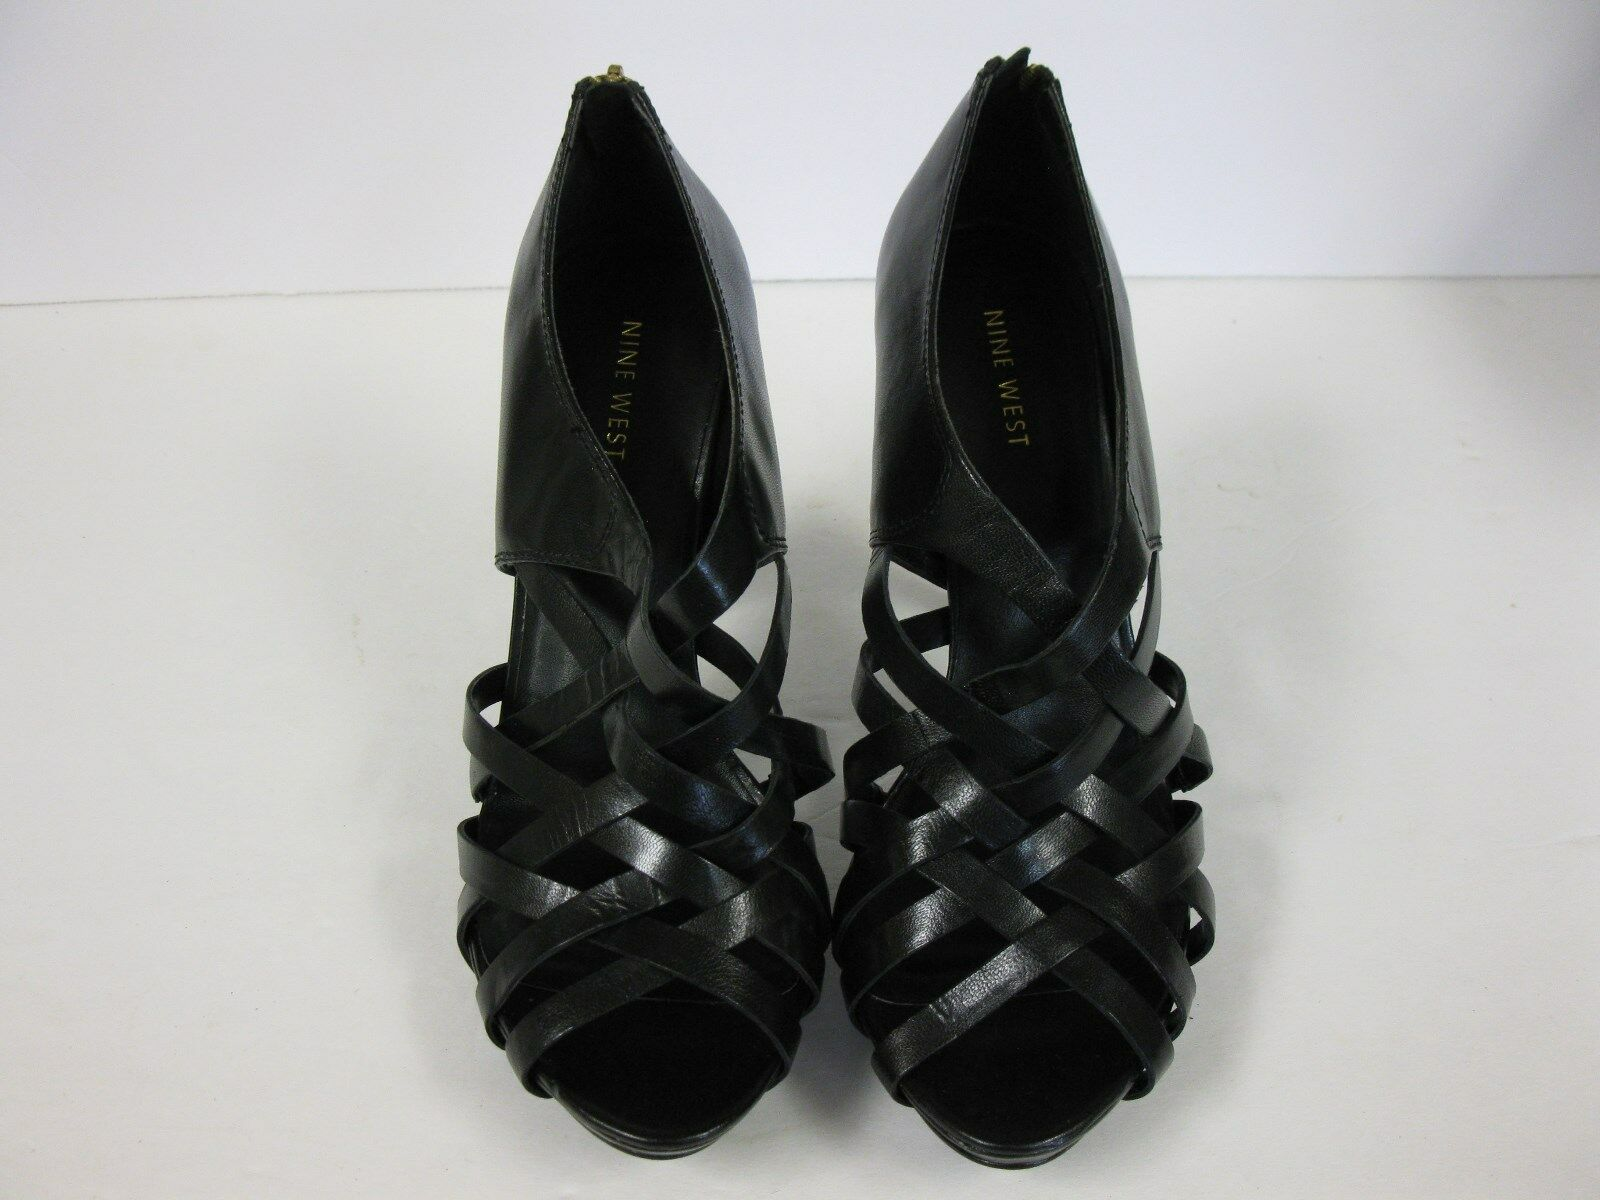 New NINE WEST everx5 Black  leather high heel ankle zip boots US Sz 9.5